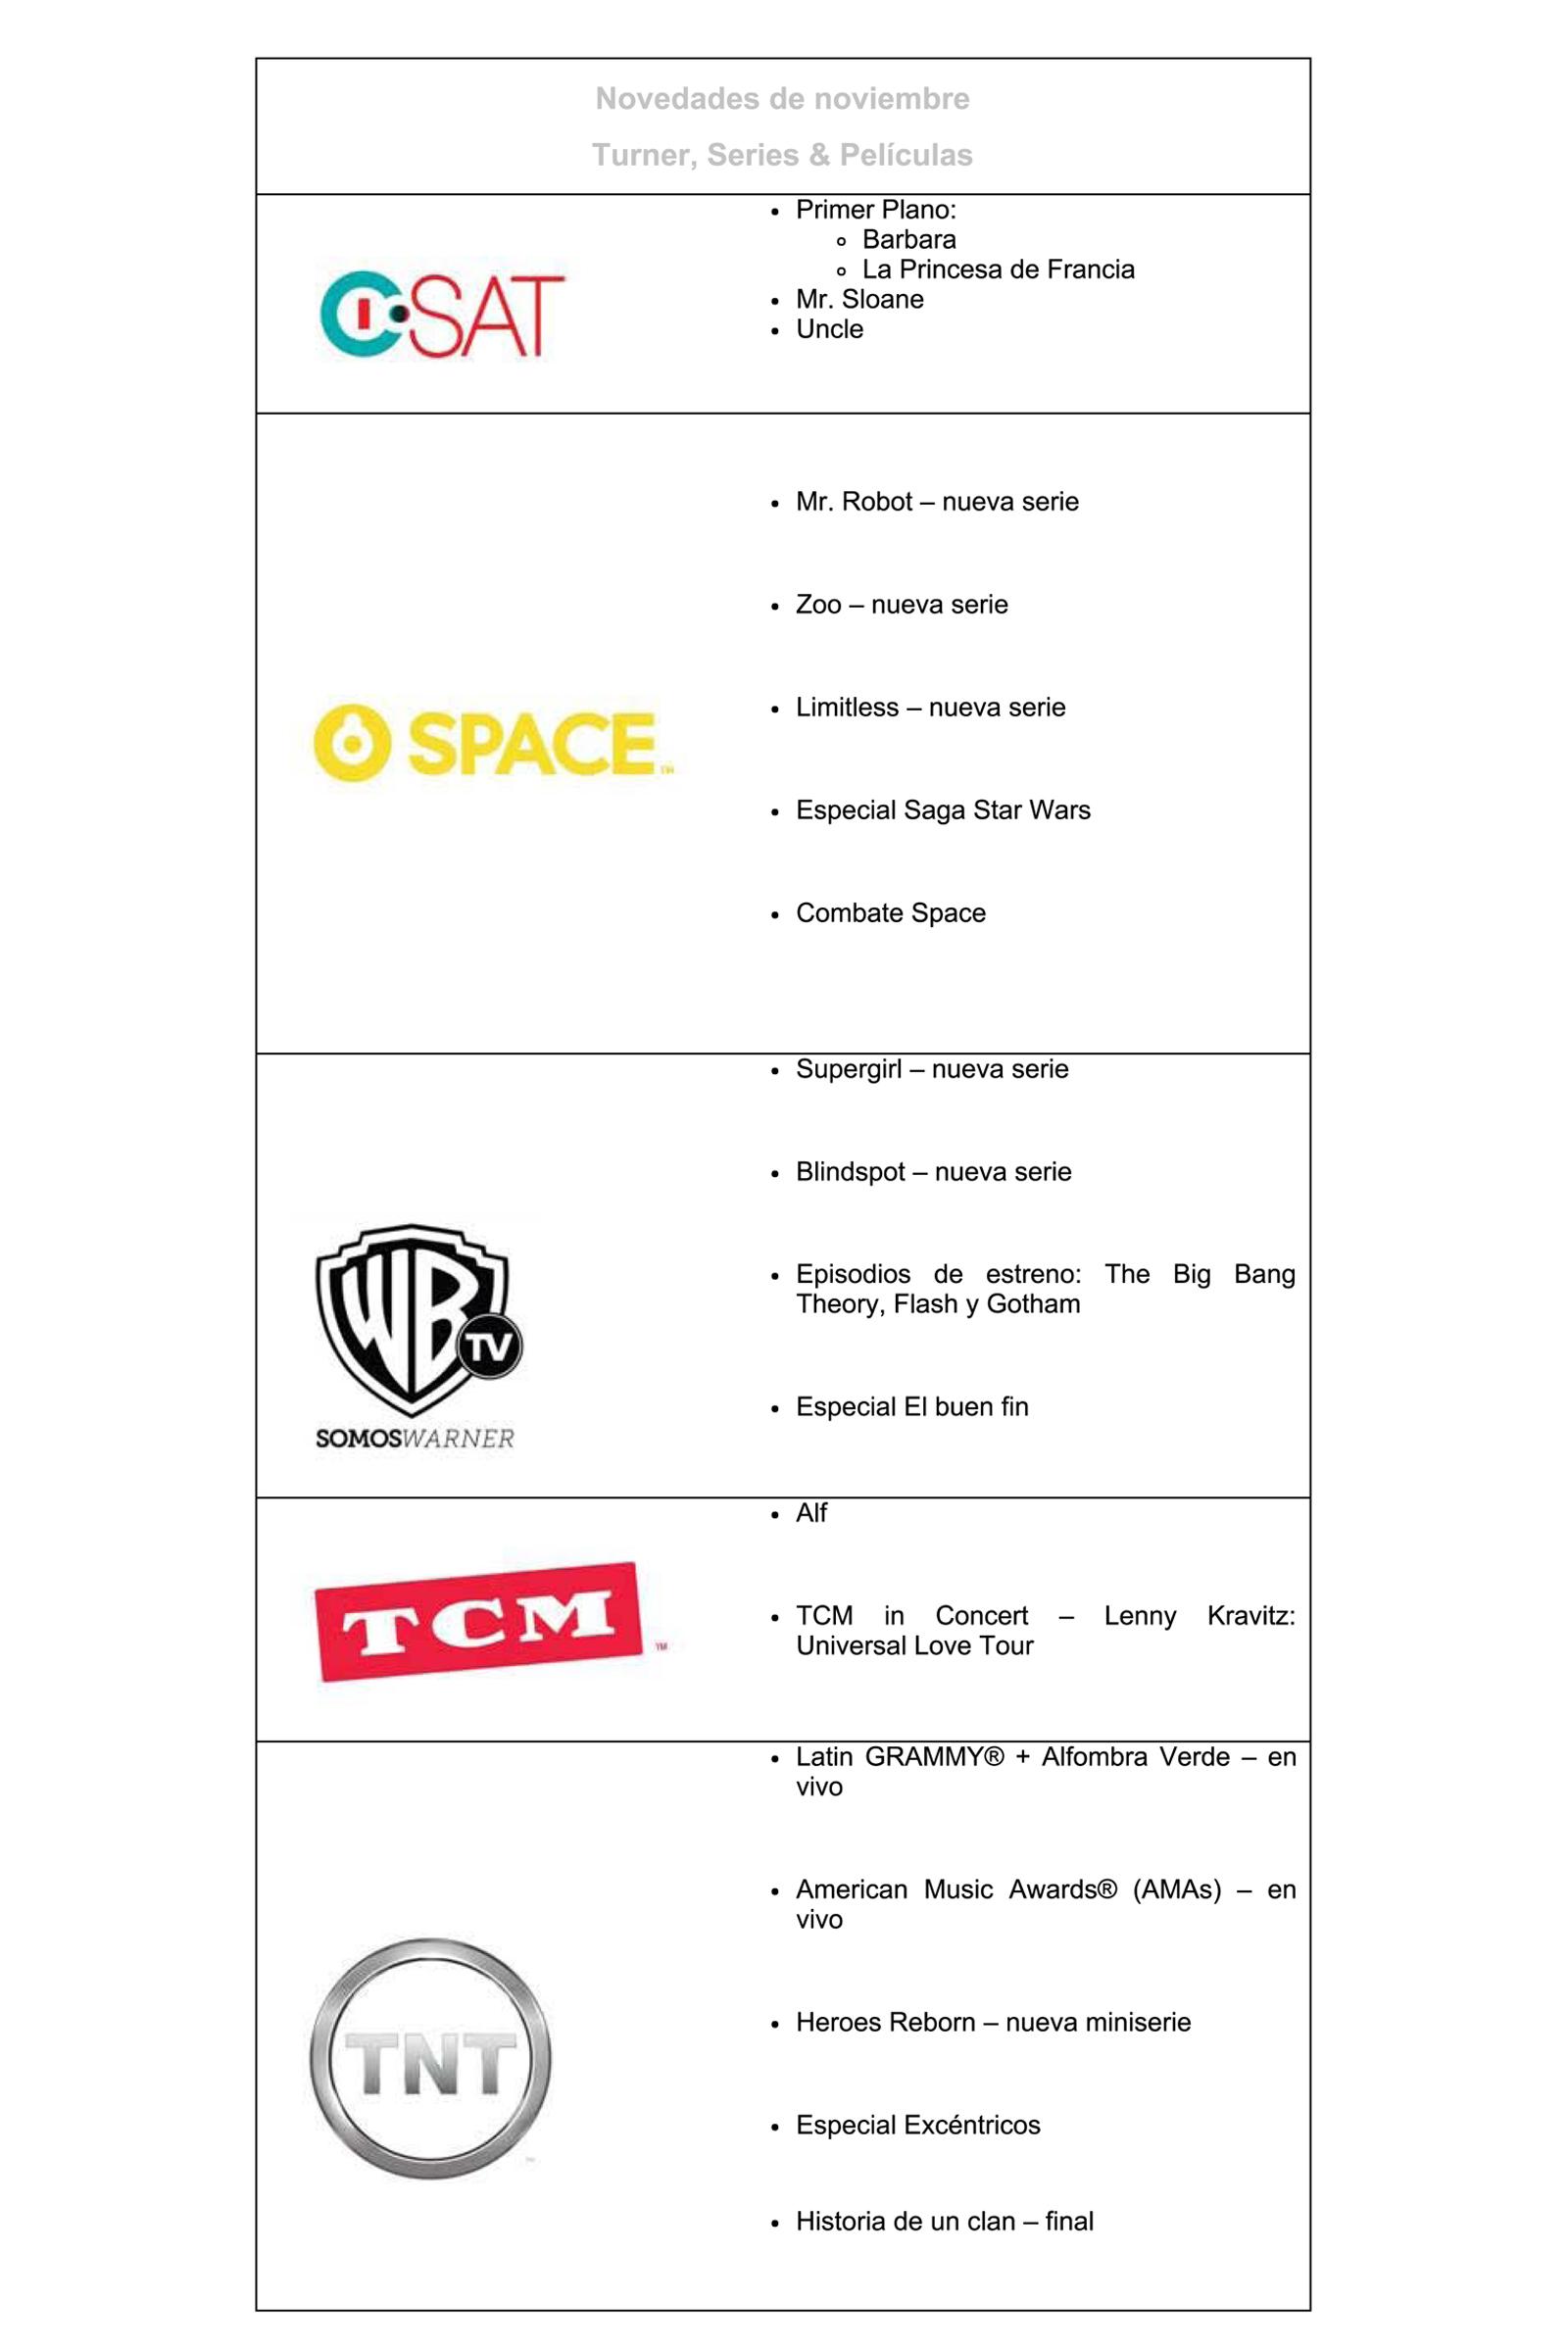 Gmail - Fwd: En noviembre I.Sat, Space,...rner Channel presentan